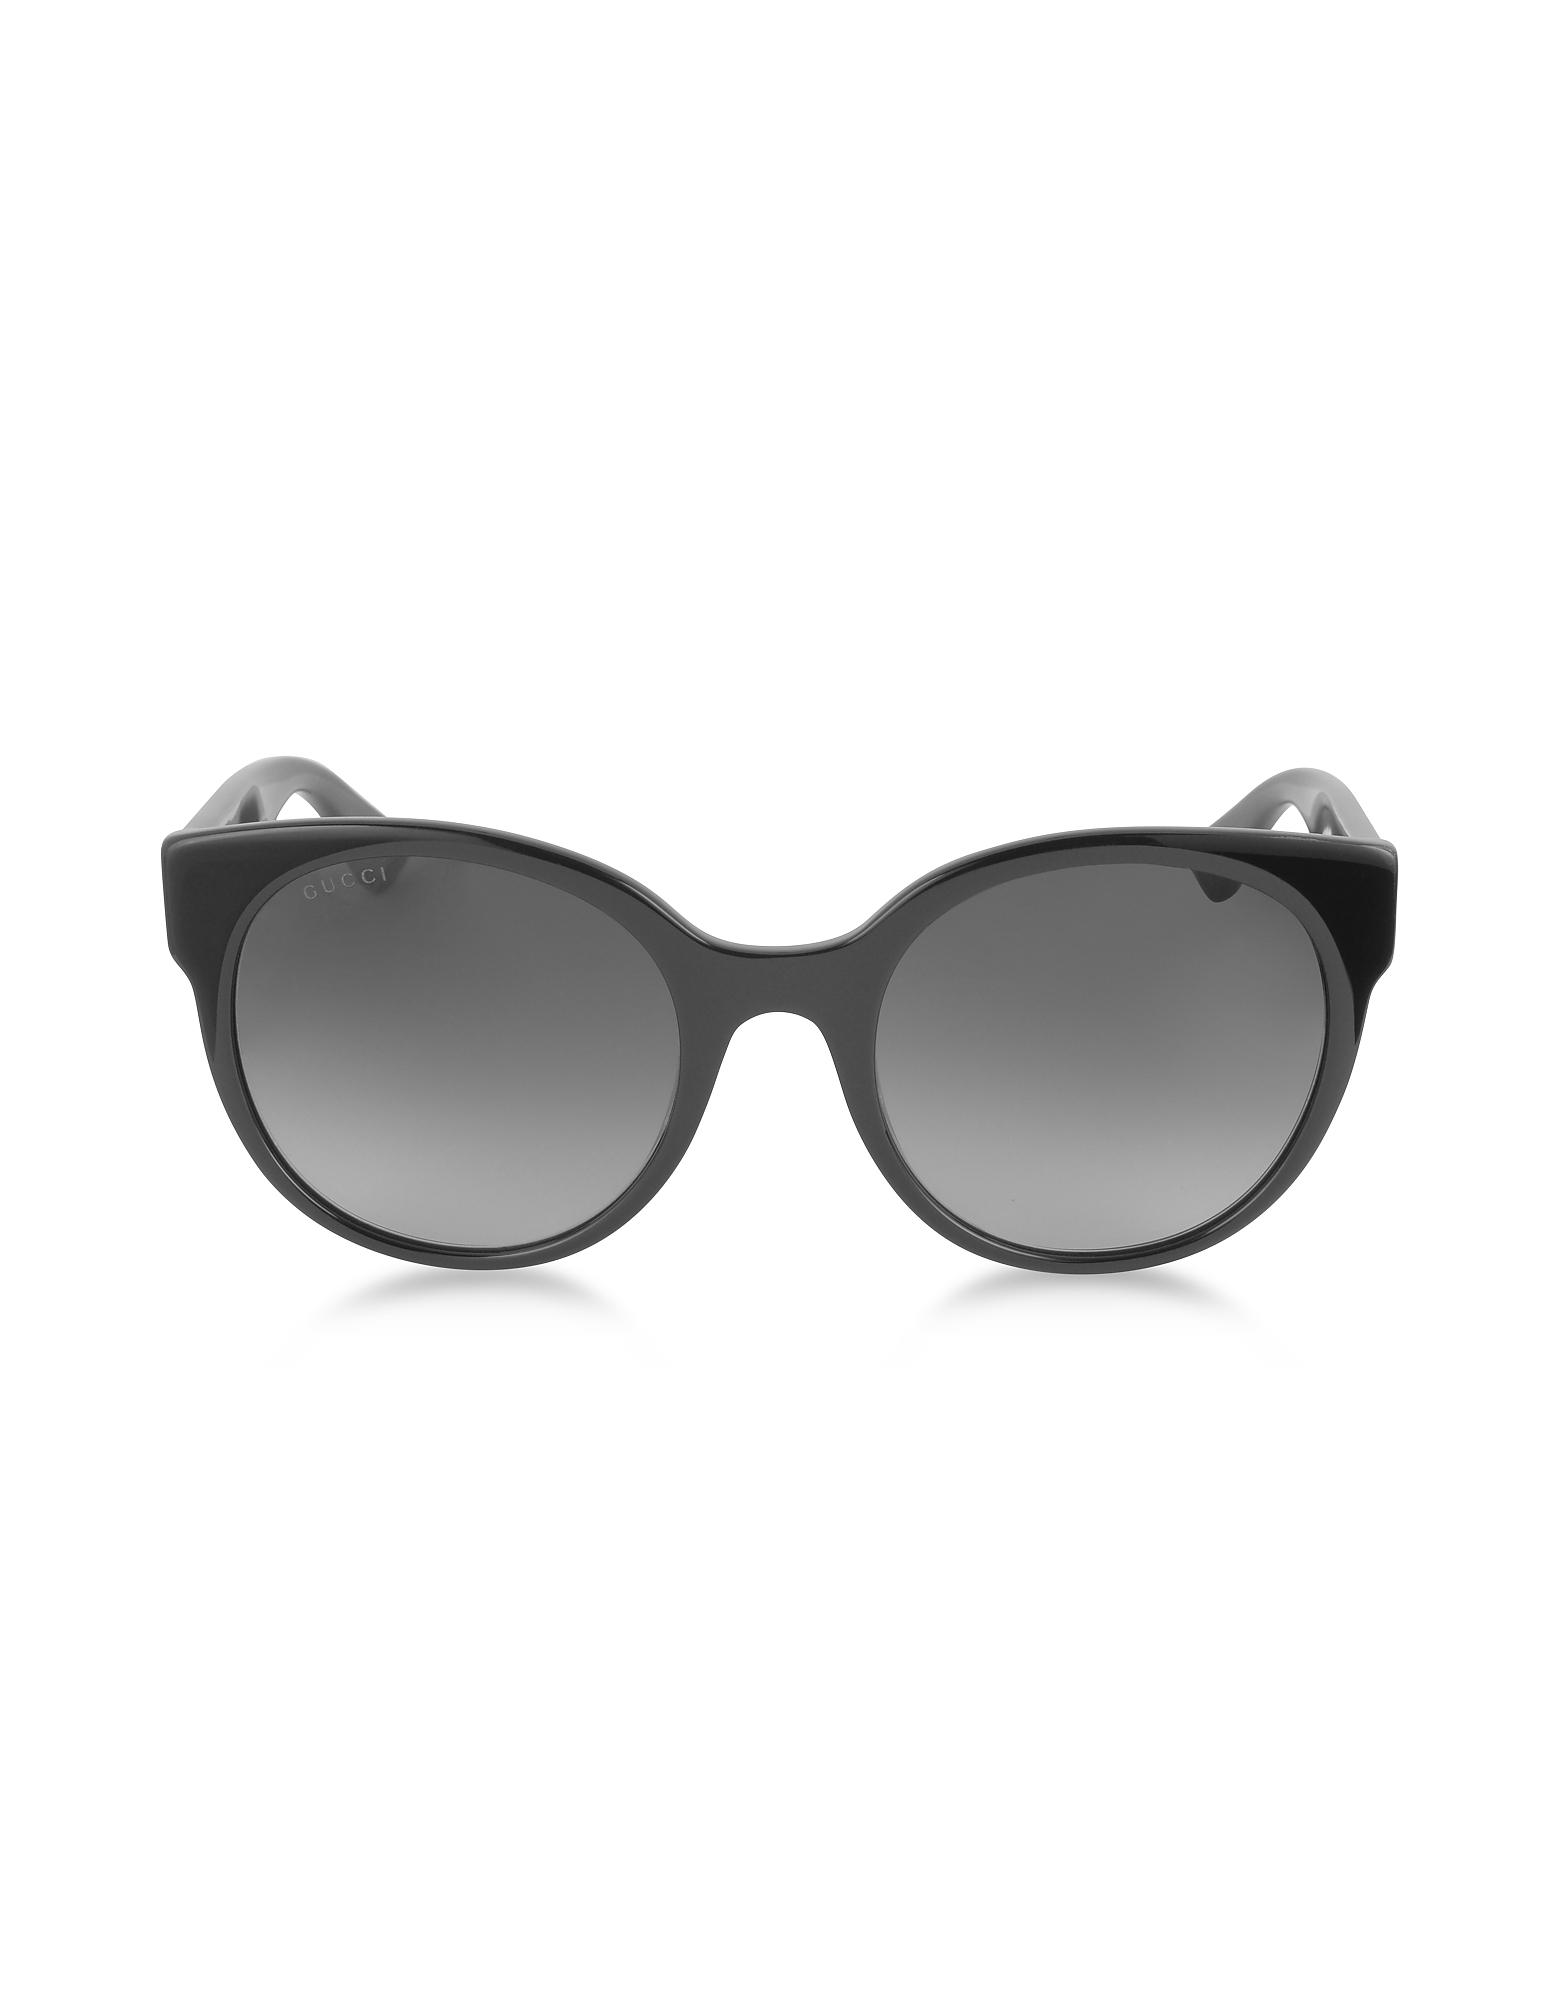 49eb18e2d9b Gucci - GG0035S 001 Black Optyl Round Women s Sunglasses - Lyst. View  fullscreen